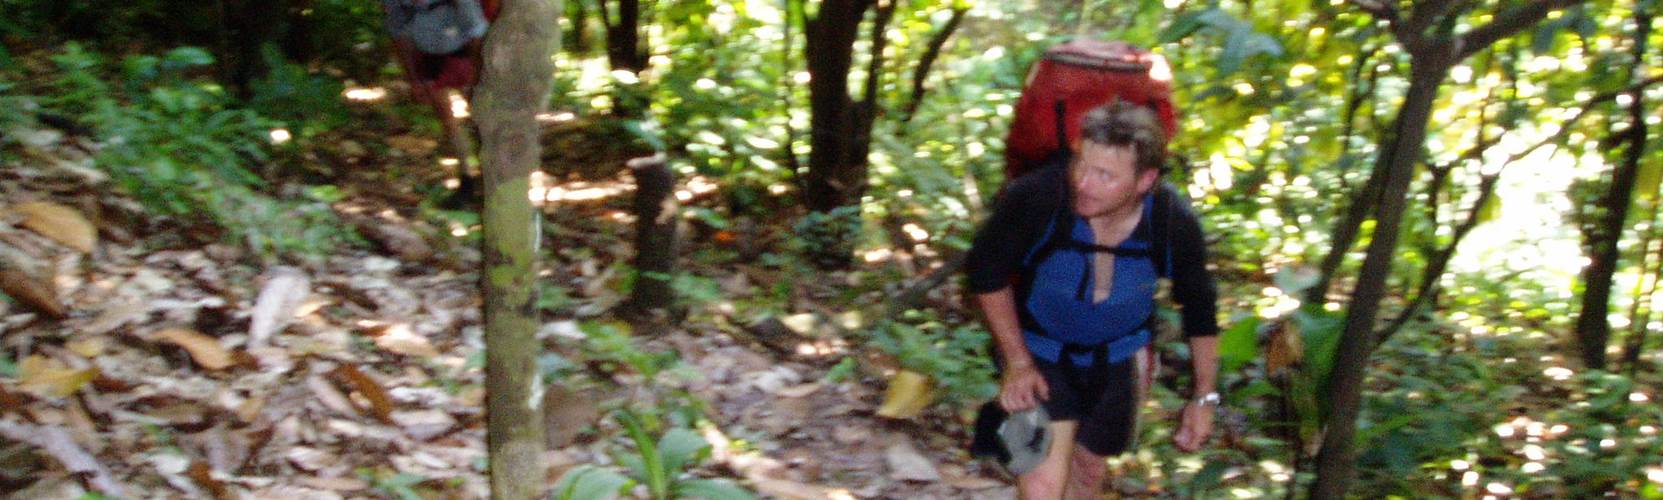 Jungle Survival Tips | Adventure Alternative blog